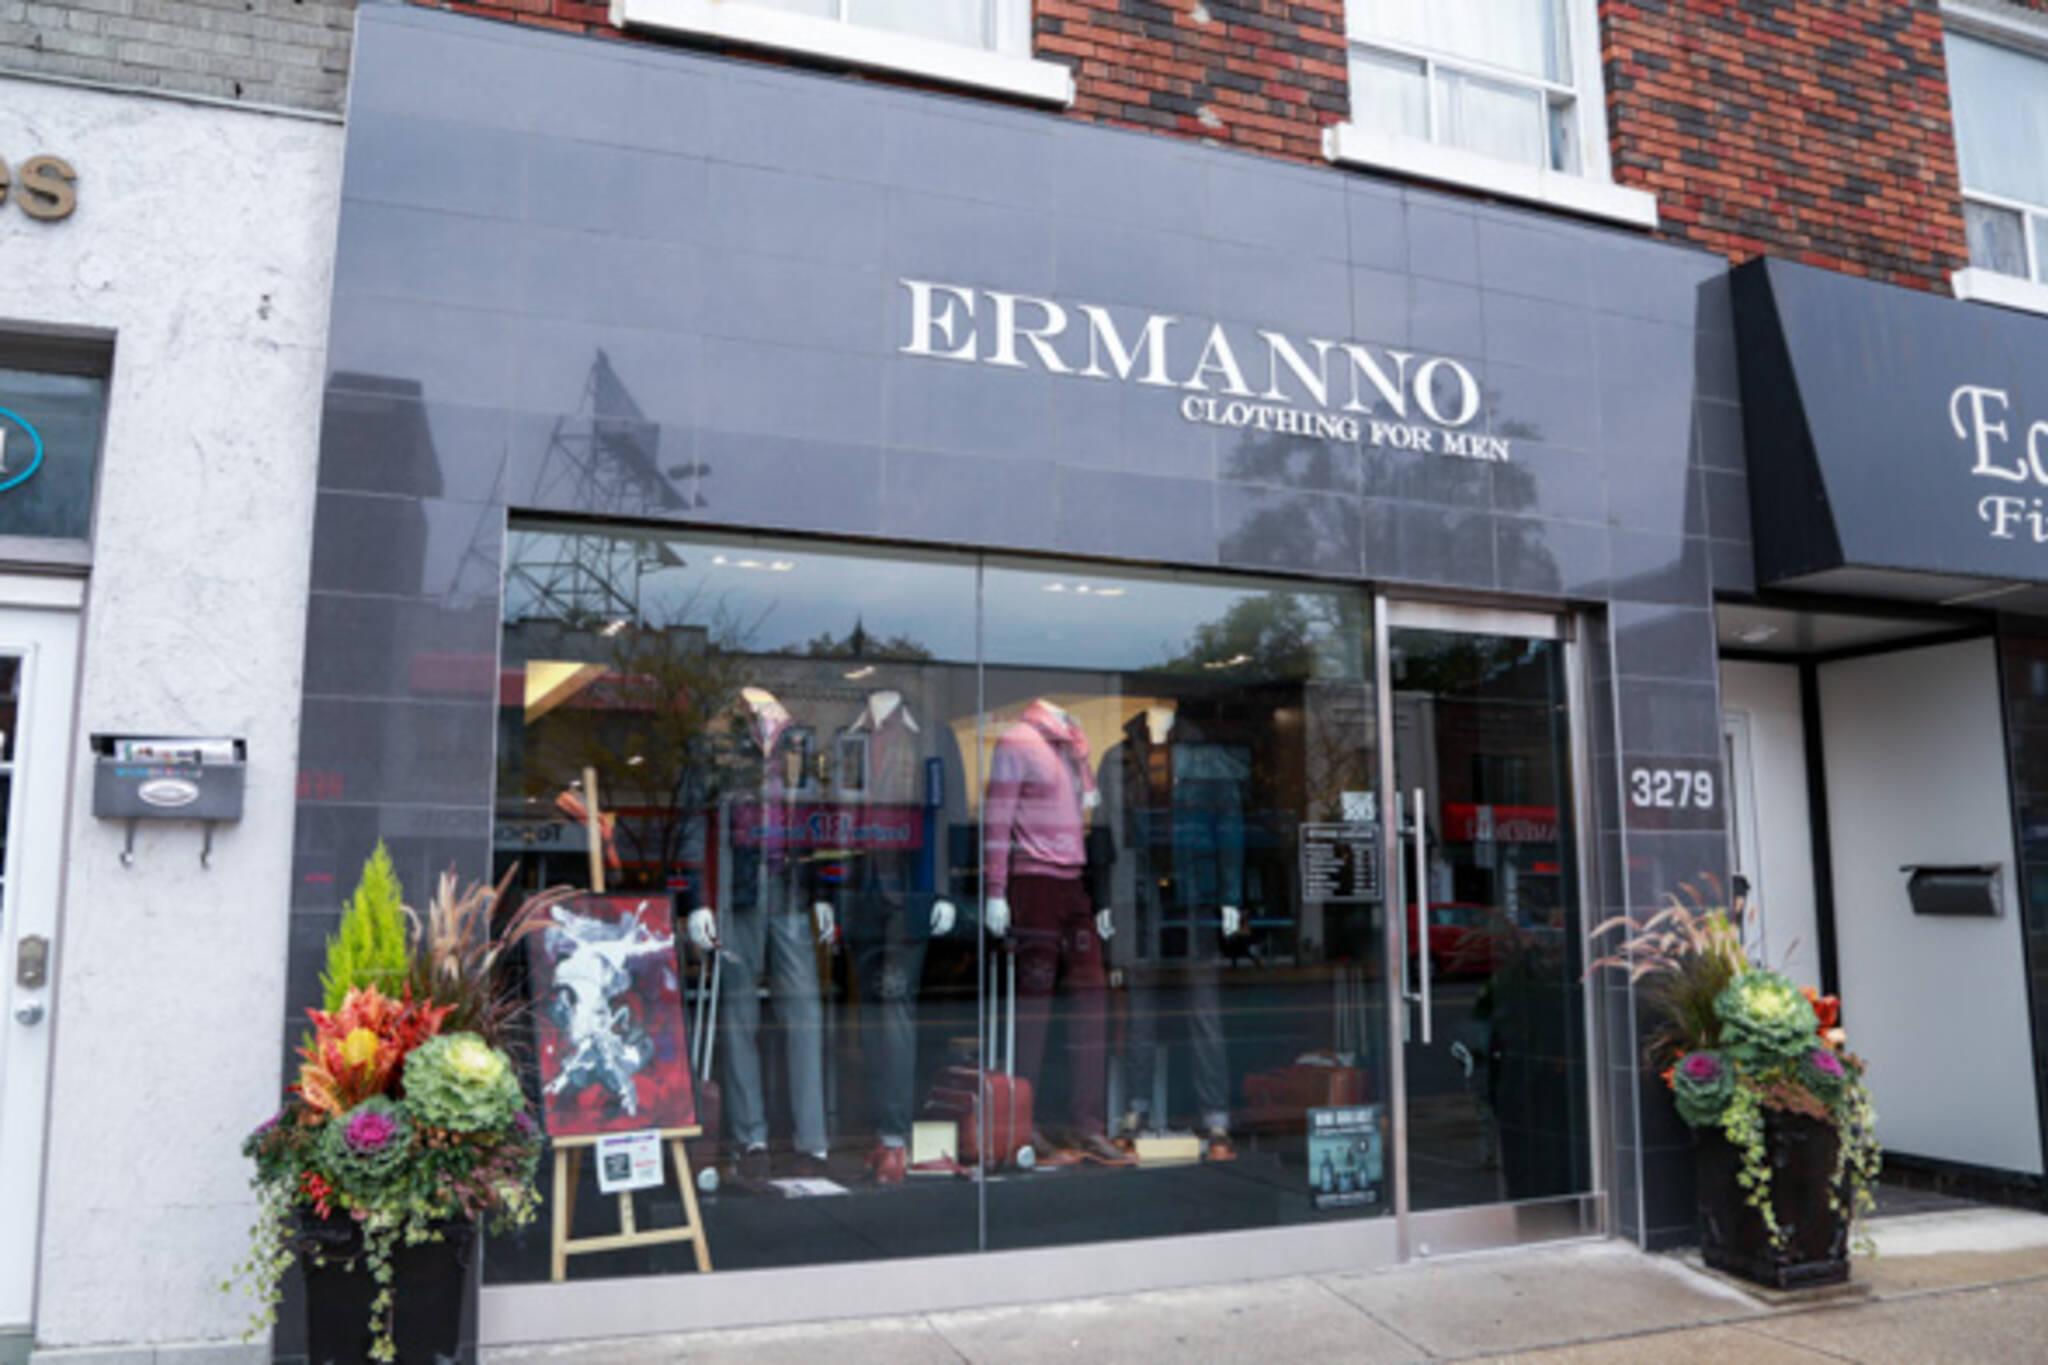 ermanno clothing